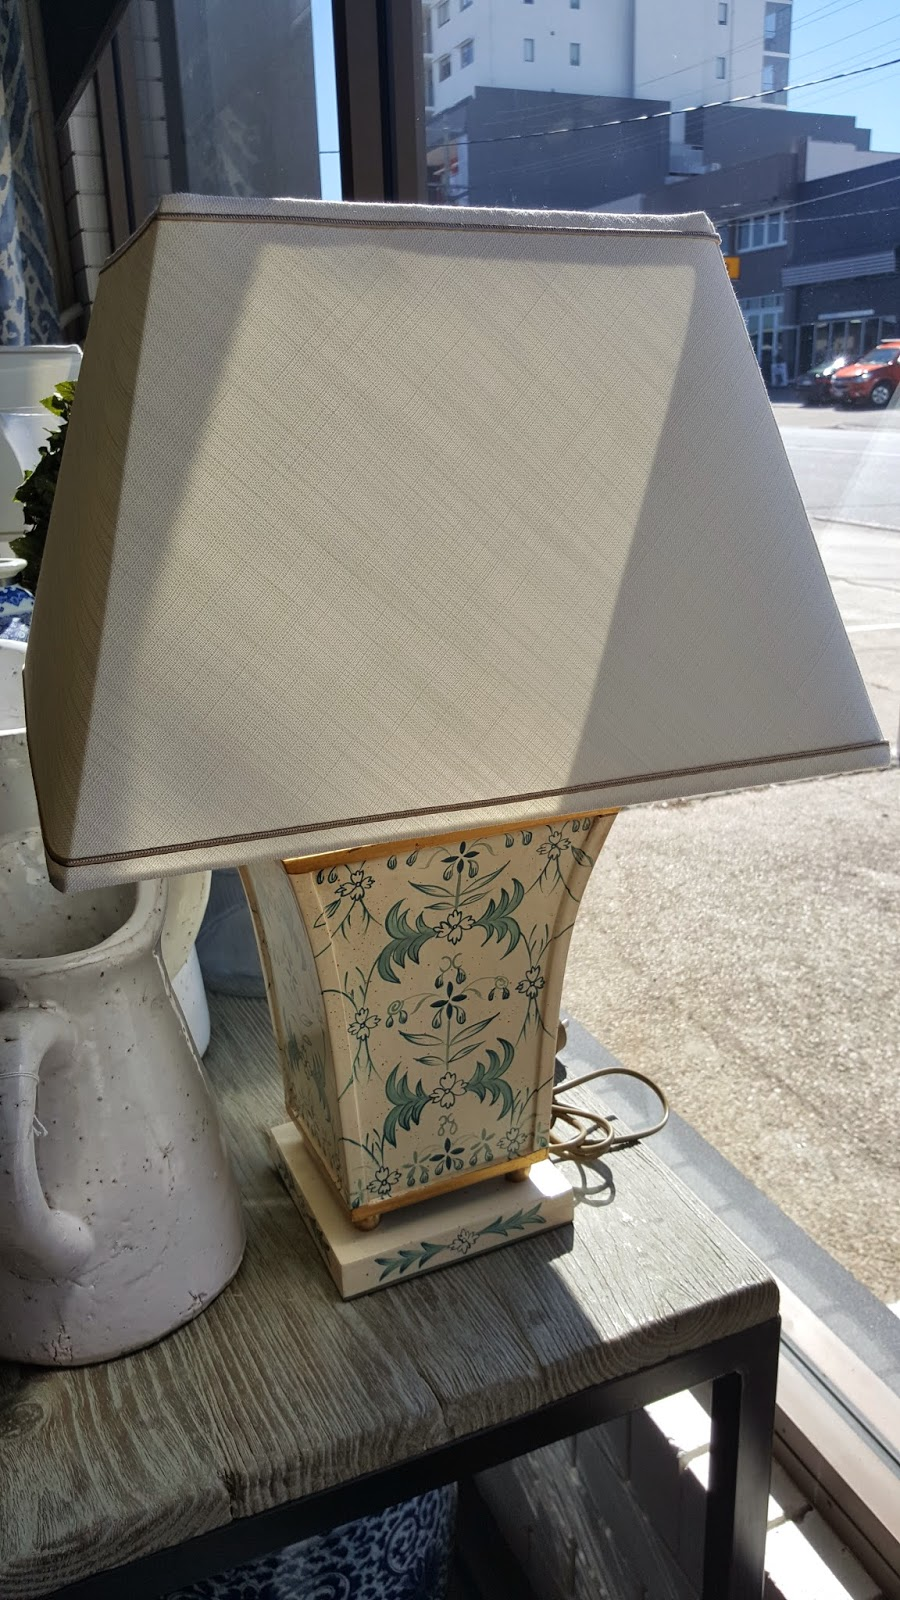 Brisbane interior design, custom made furniture, furniture sale, french furniture brisbane, drapery, curtains, blinds, rugs